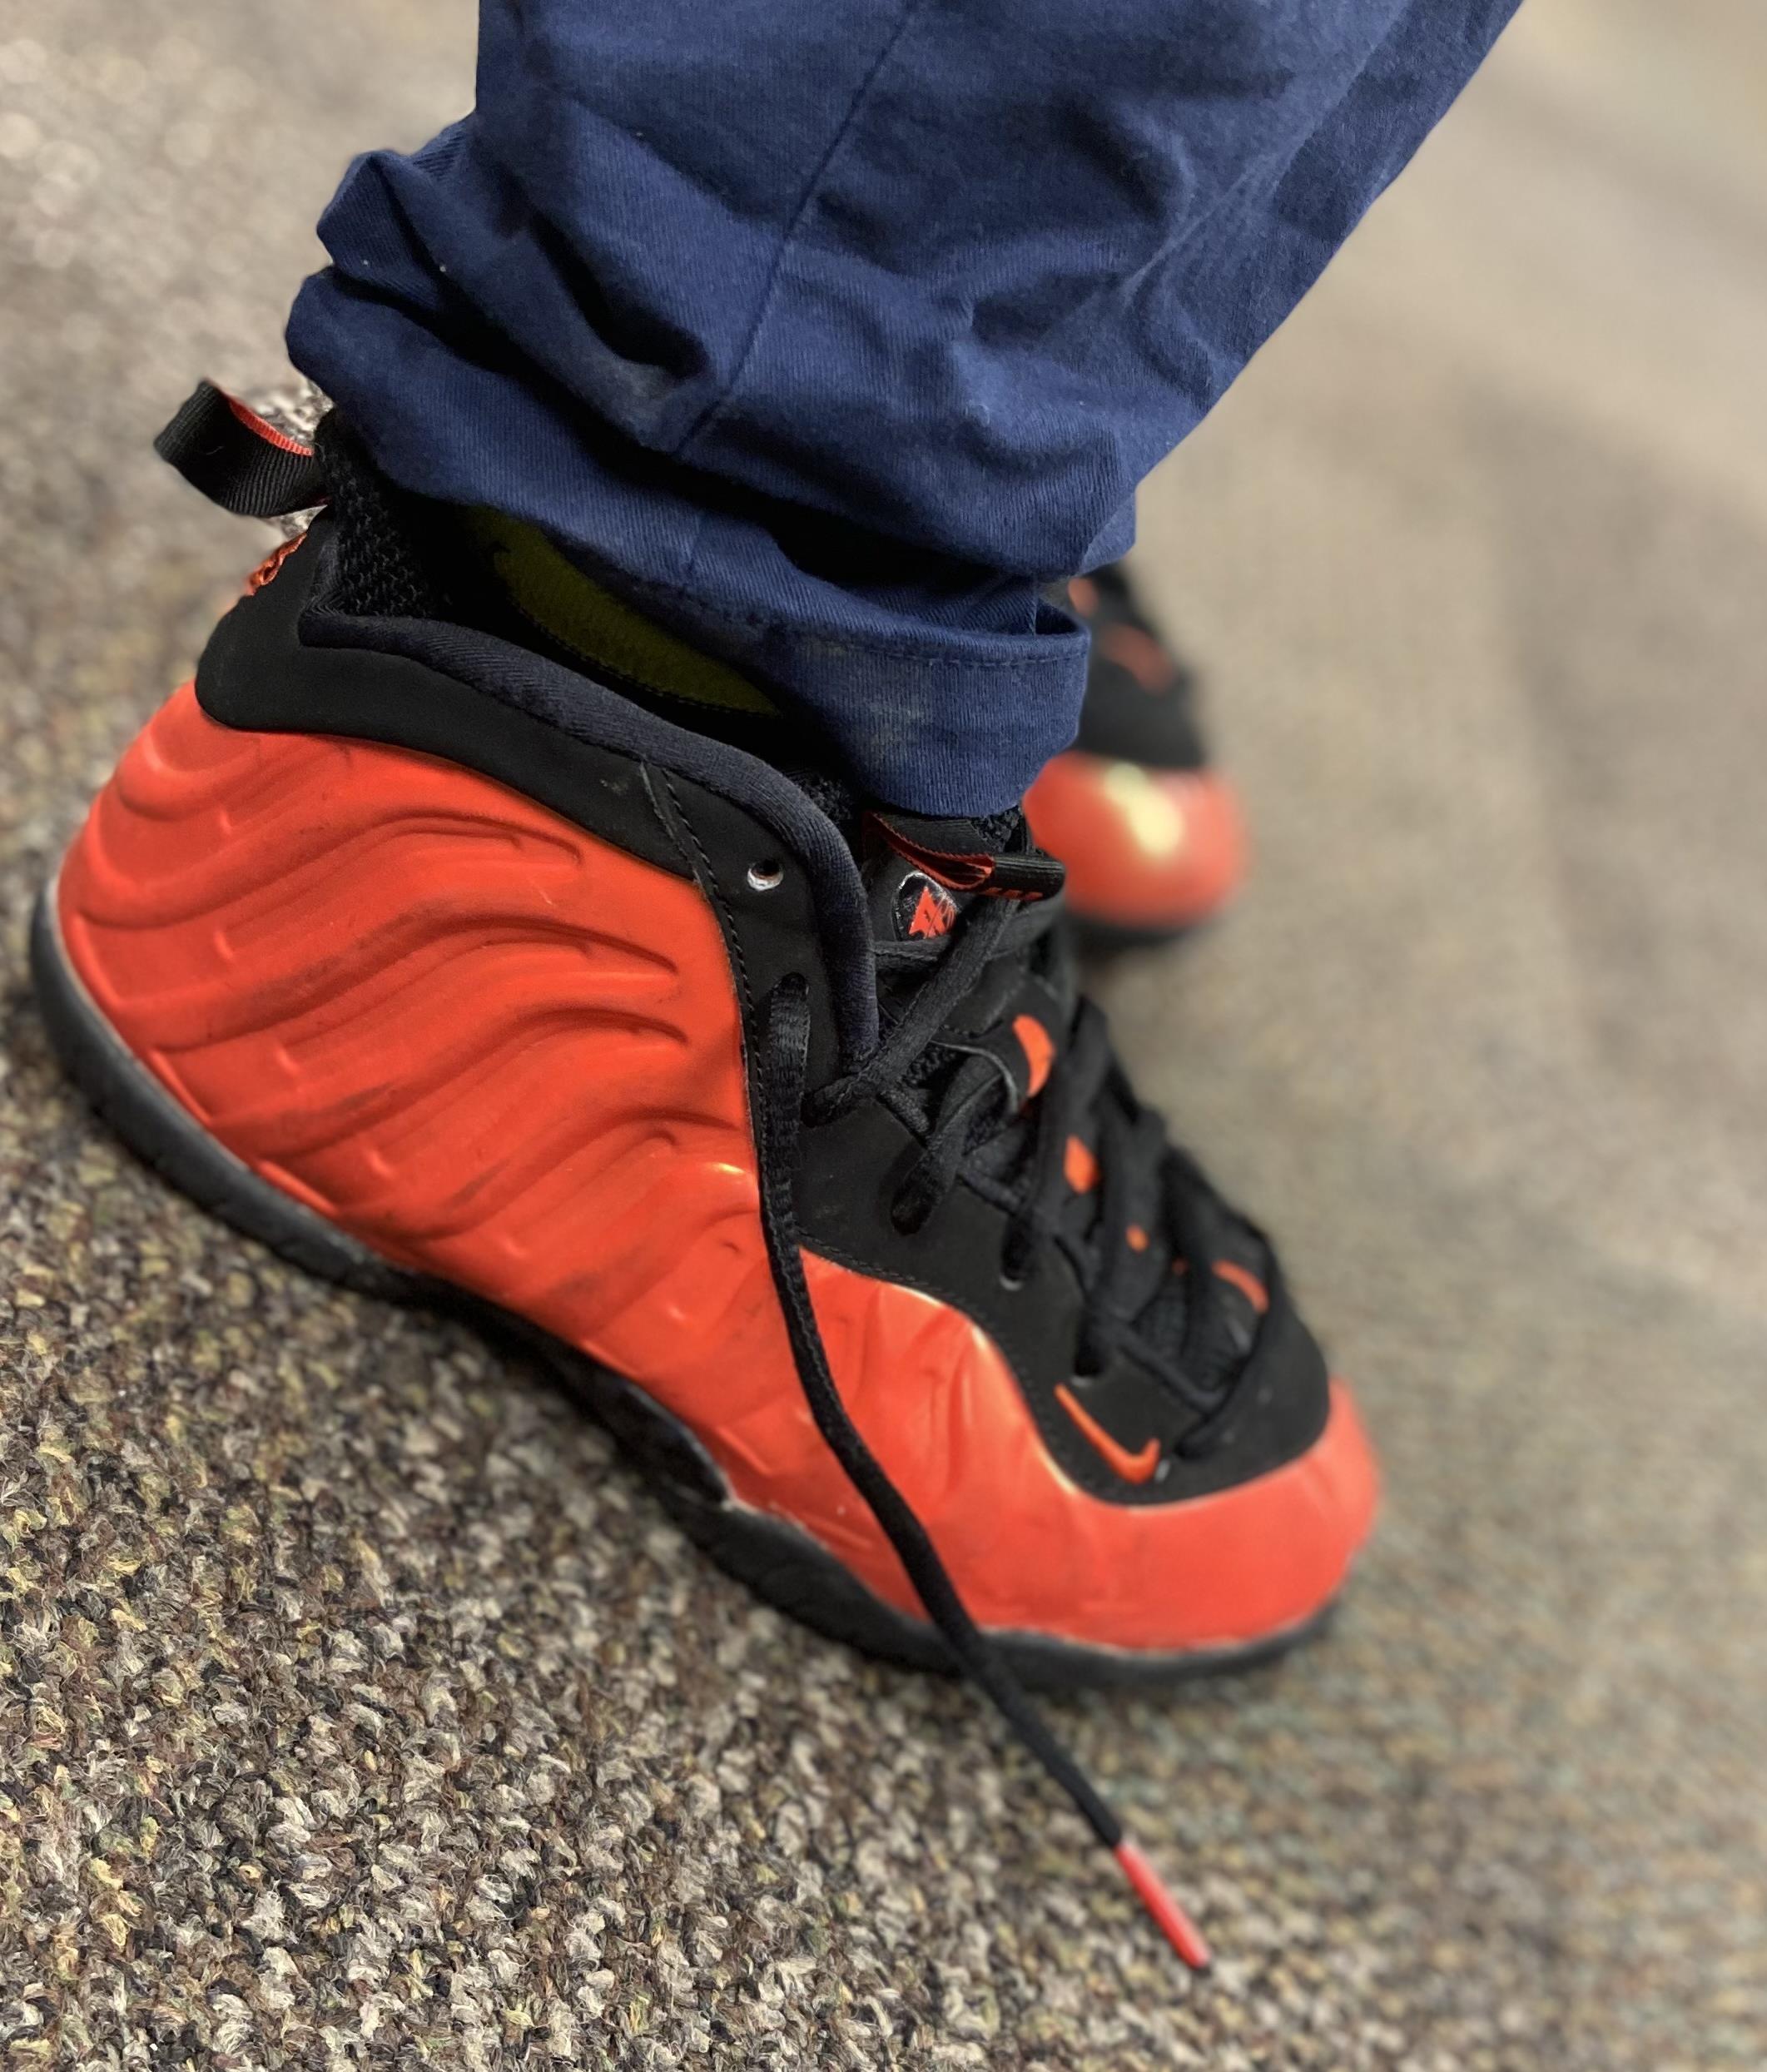 #ShoeCam #Foam